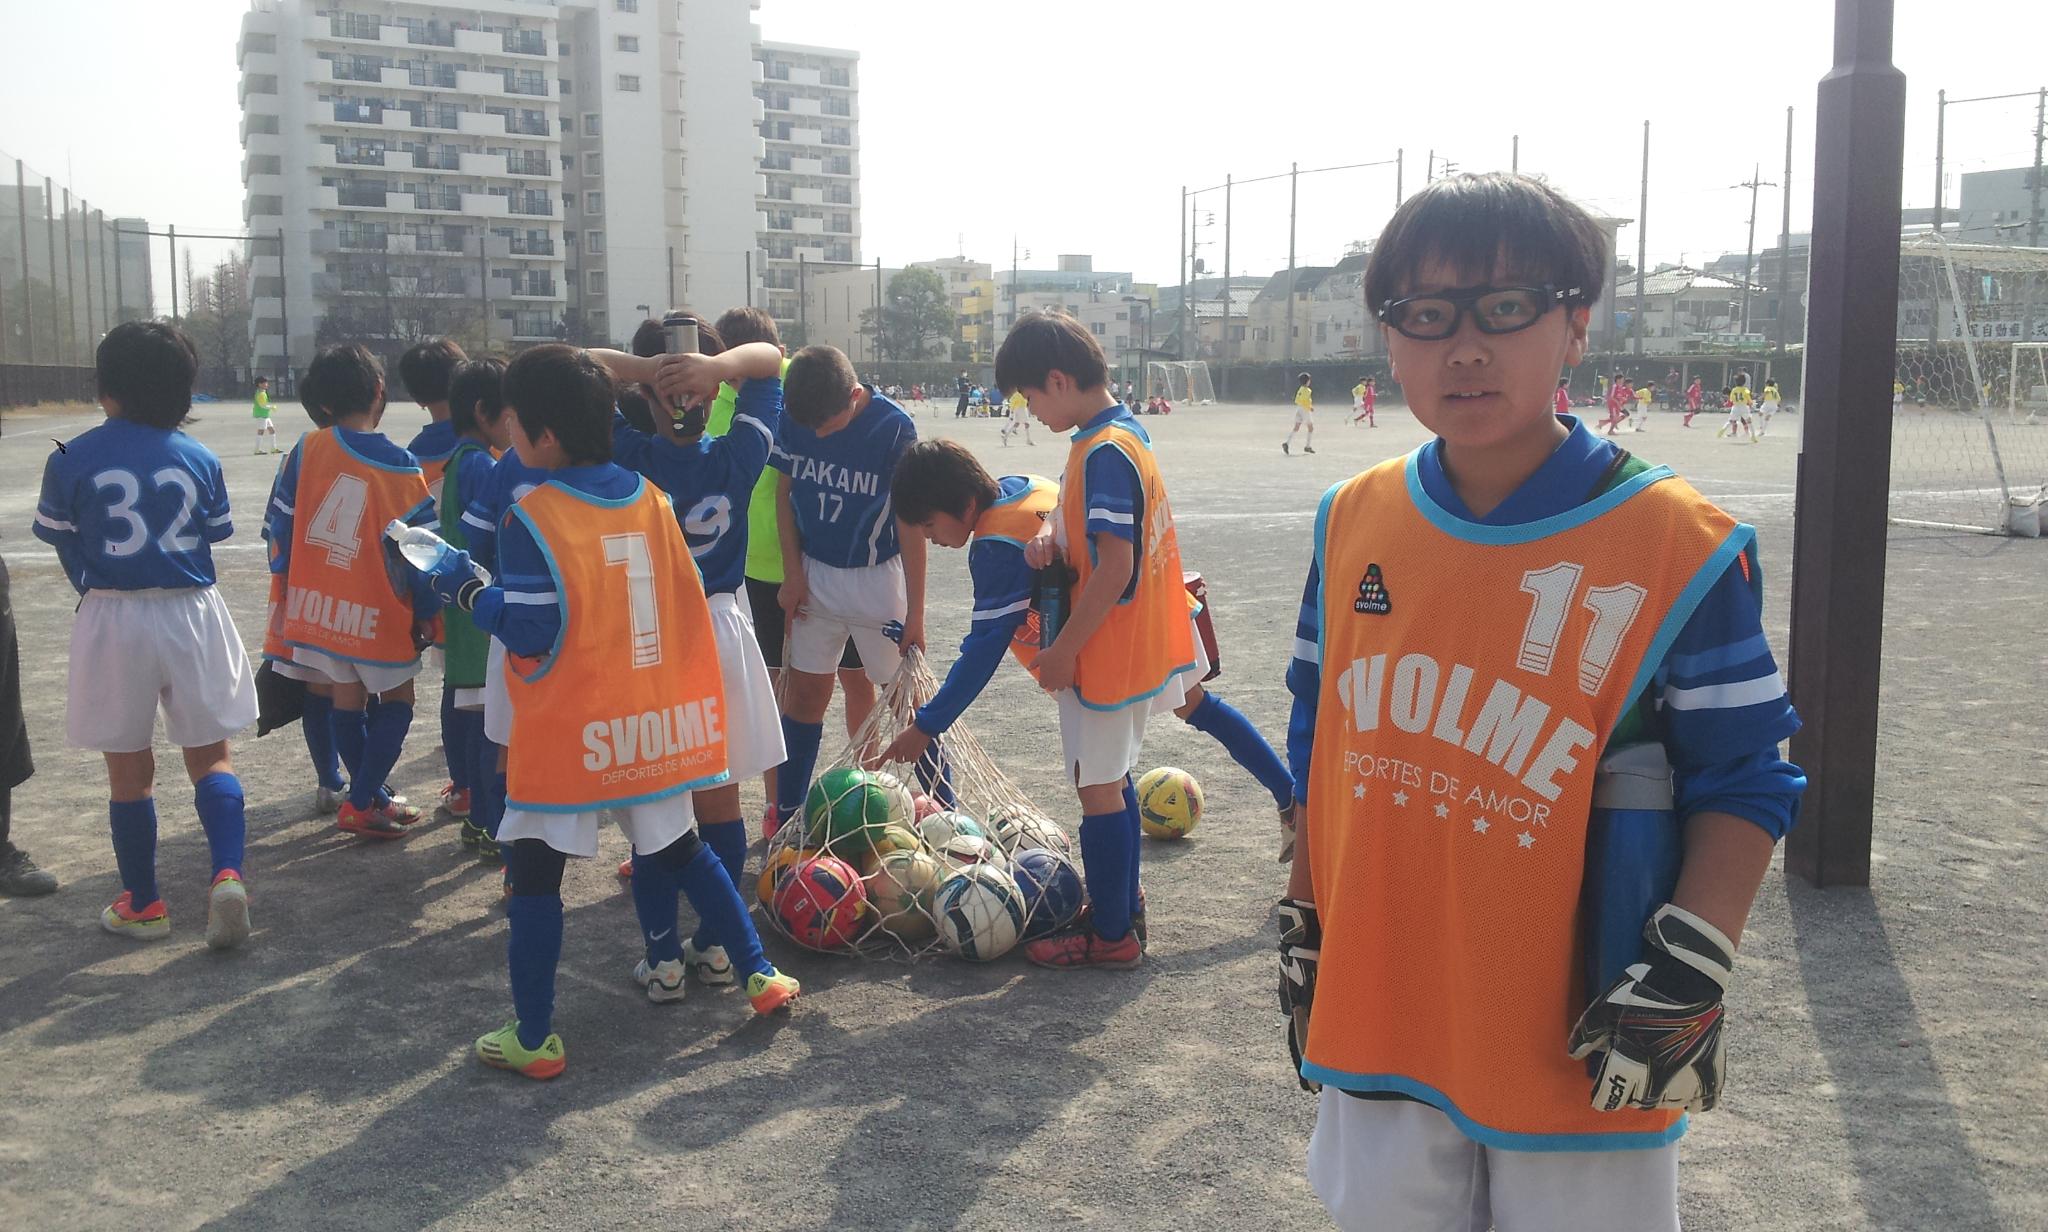 http://www.takani-sc.com/blog/photo/20160306_100623.jpg